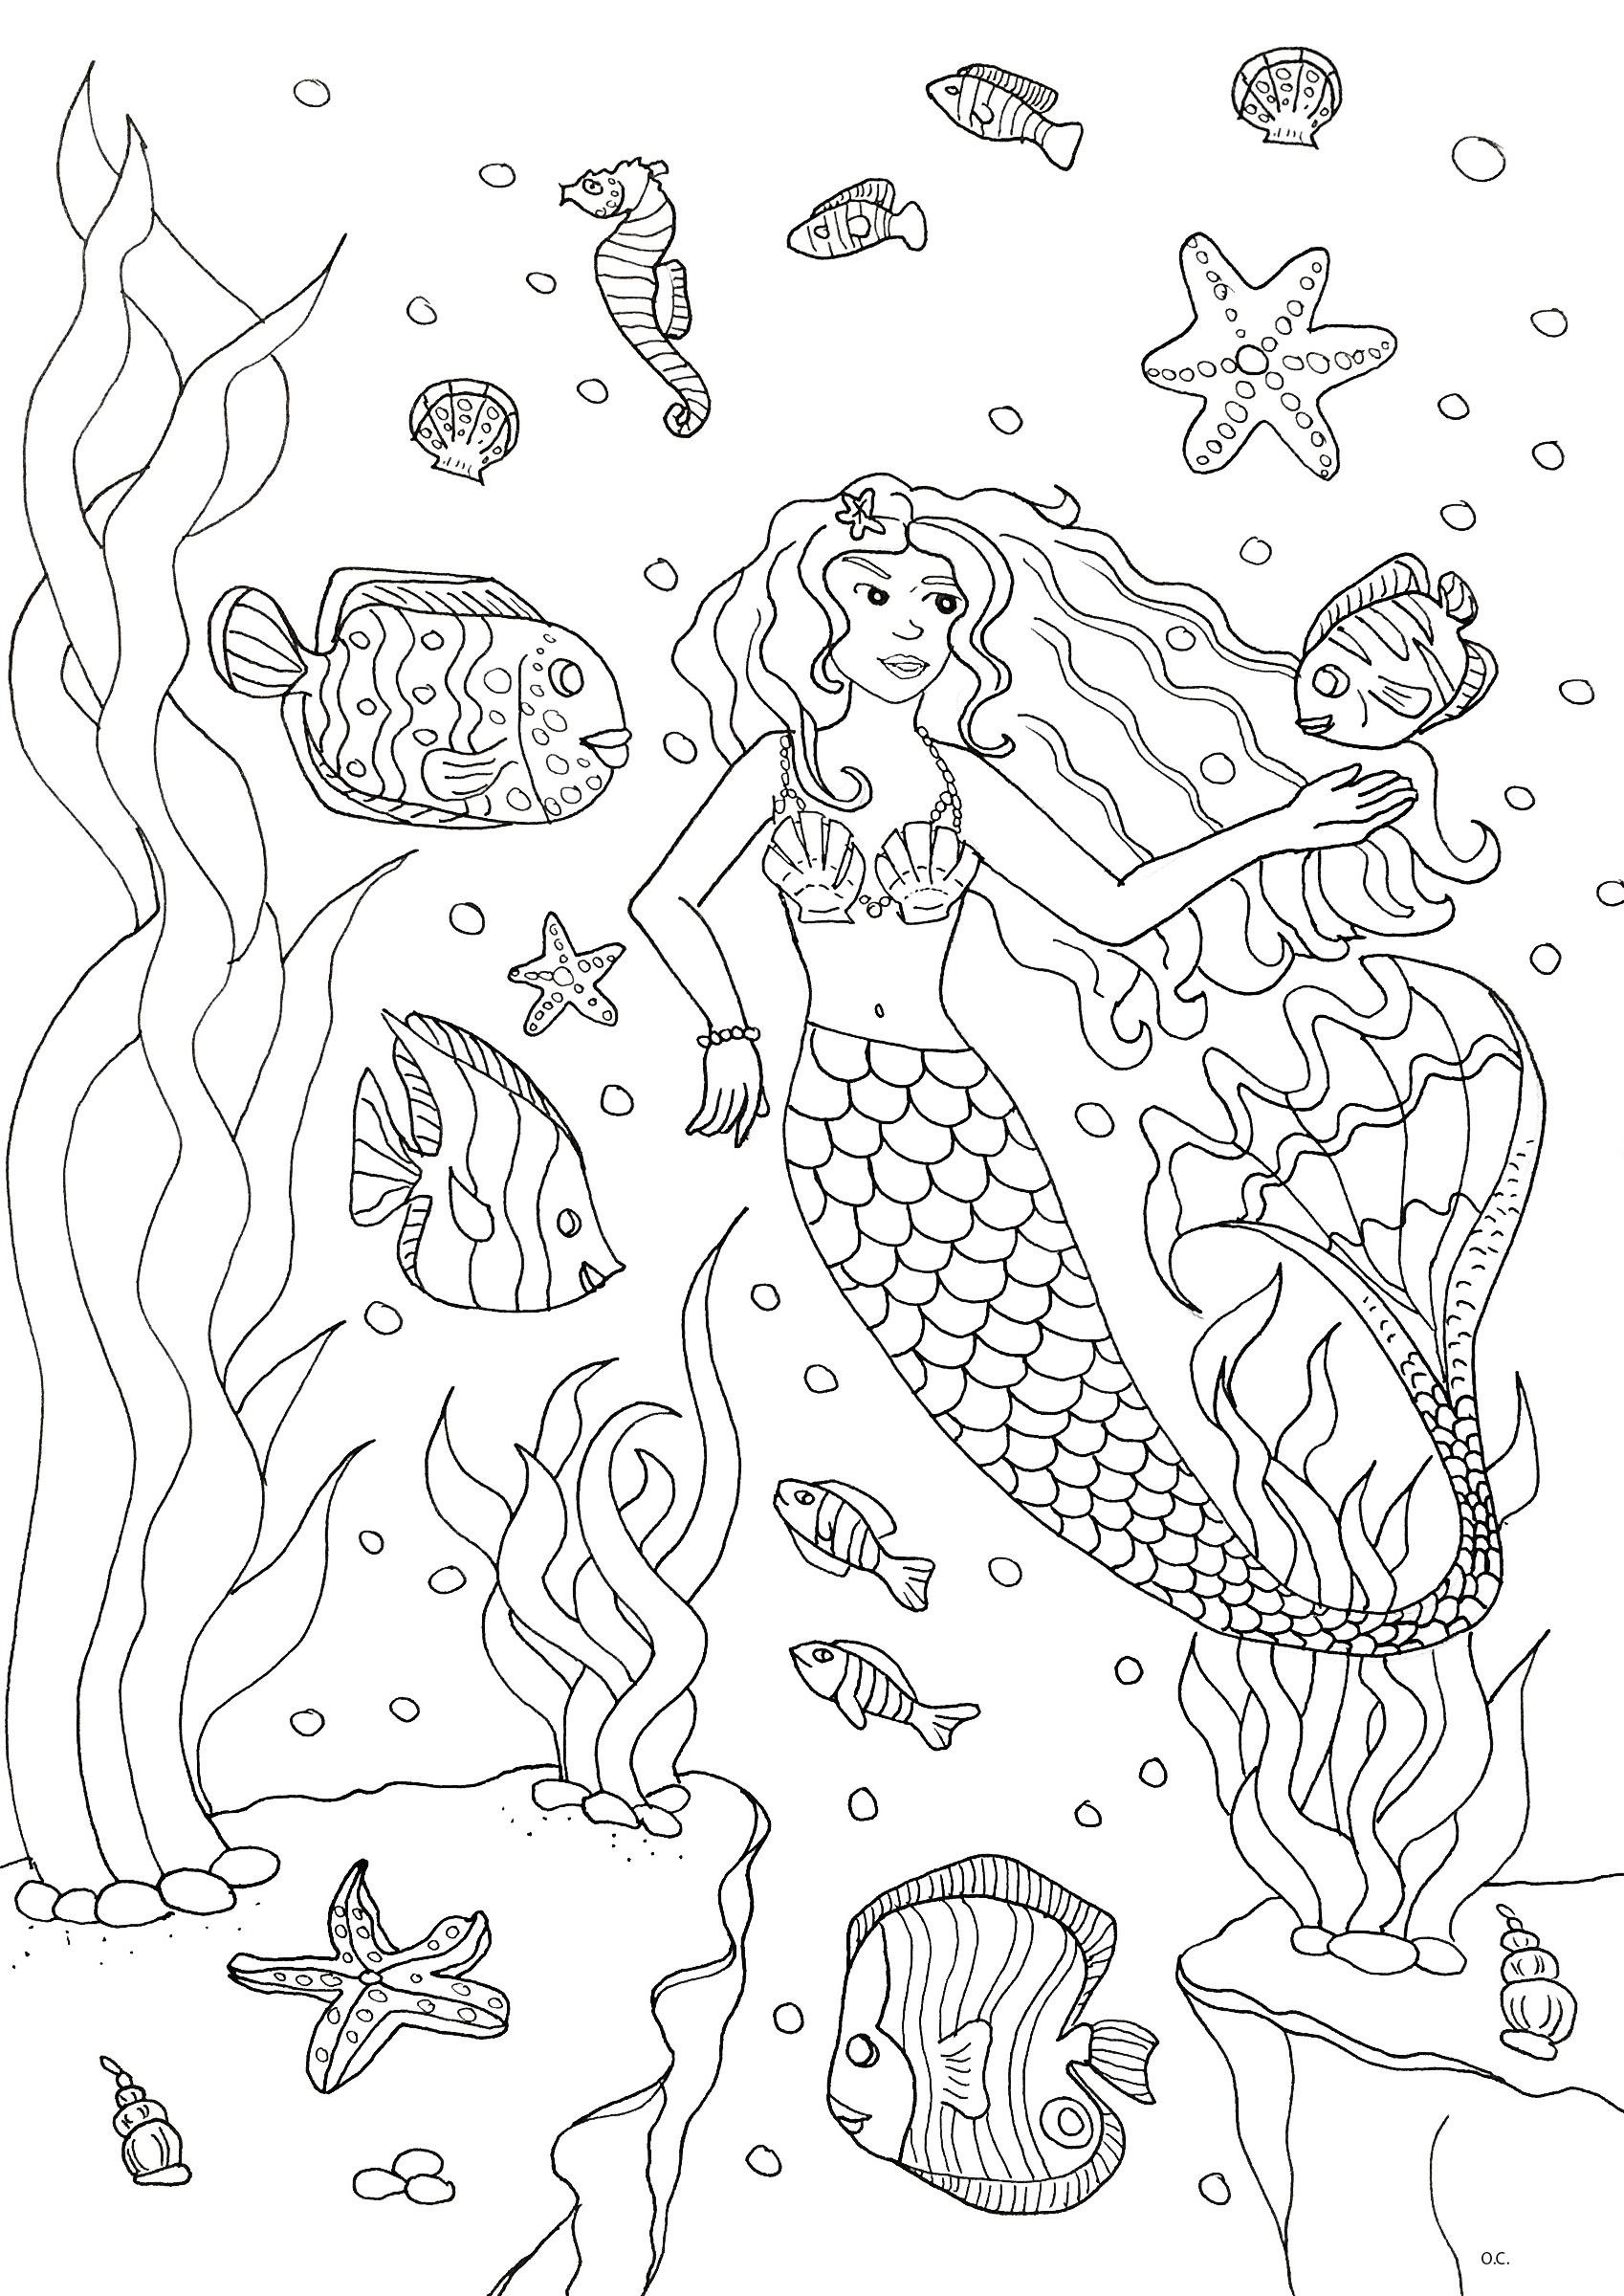 Meerjungfrauen 27849 Meerjungfrauen Malbuch Fur Erwachsene